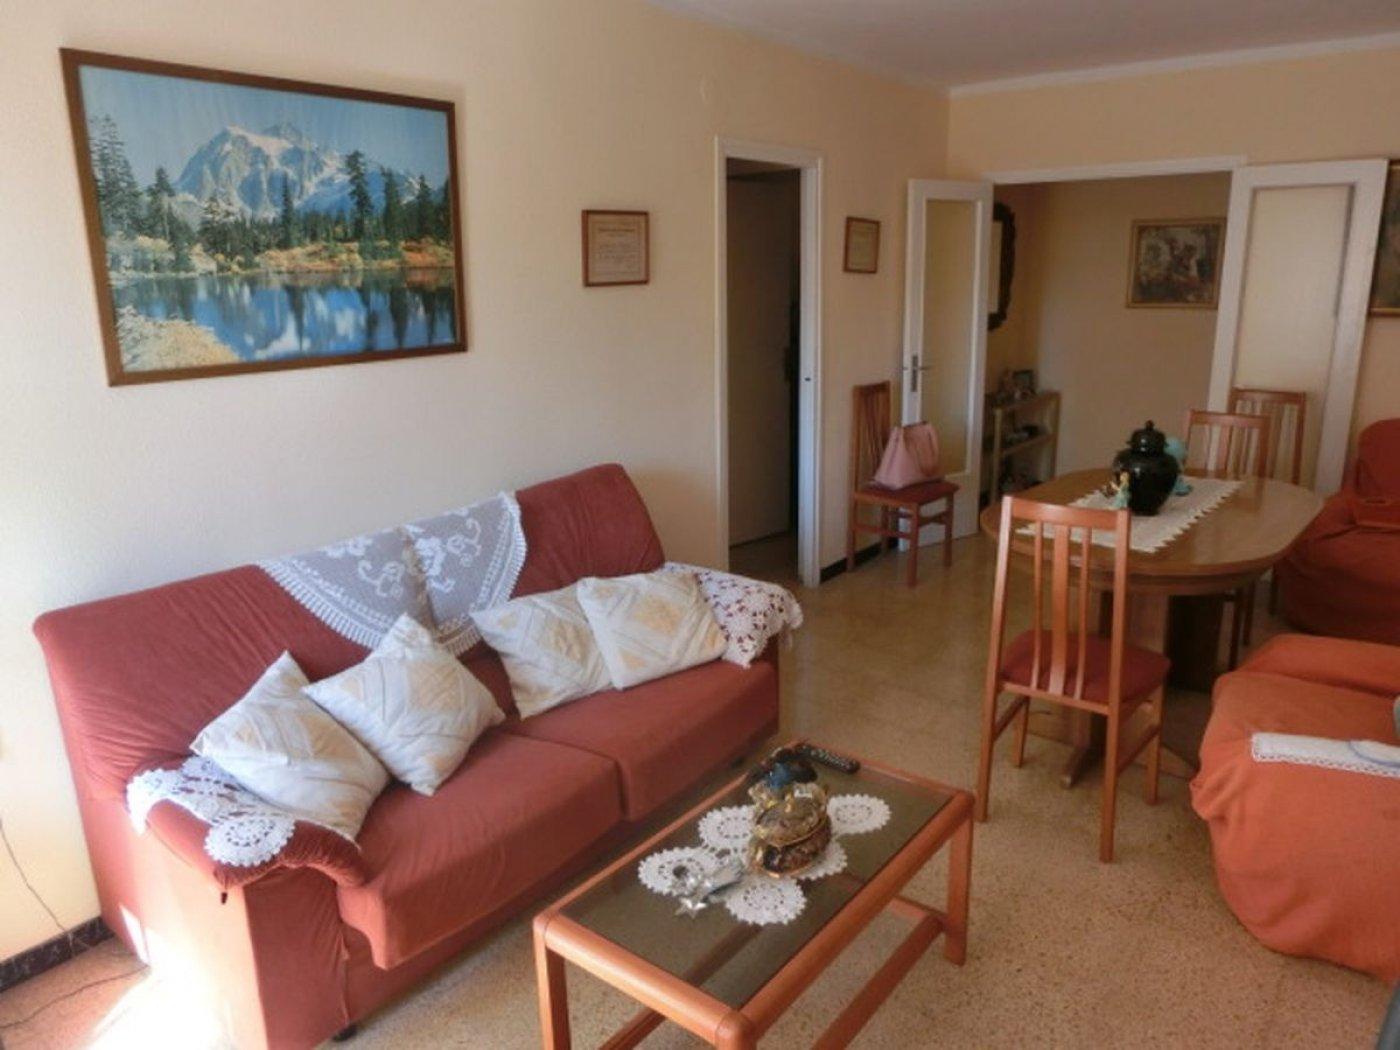 Flat for sale in Centro médico, Sant Carles de la Rapita